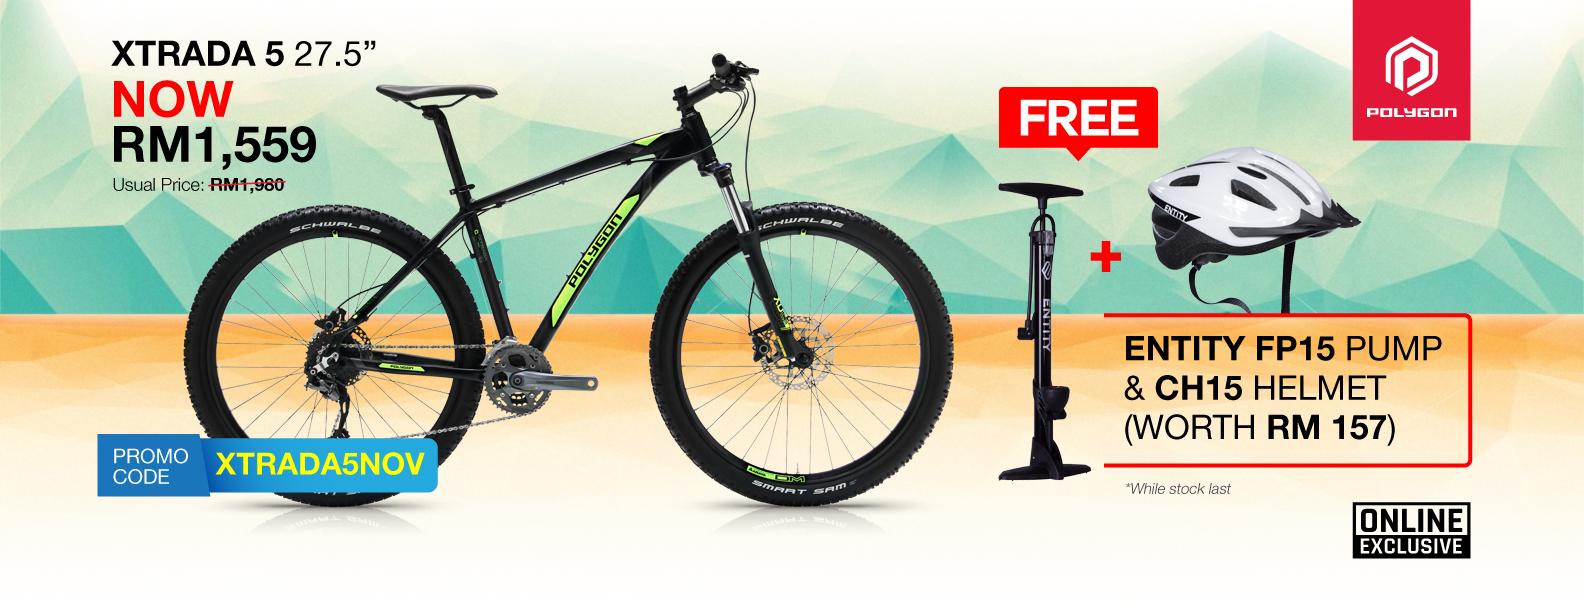 Polygon Xtrada 5 Bike Free Gift Promotion